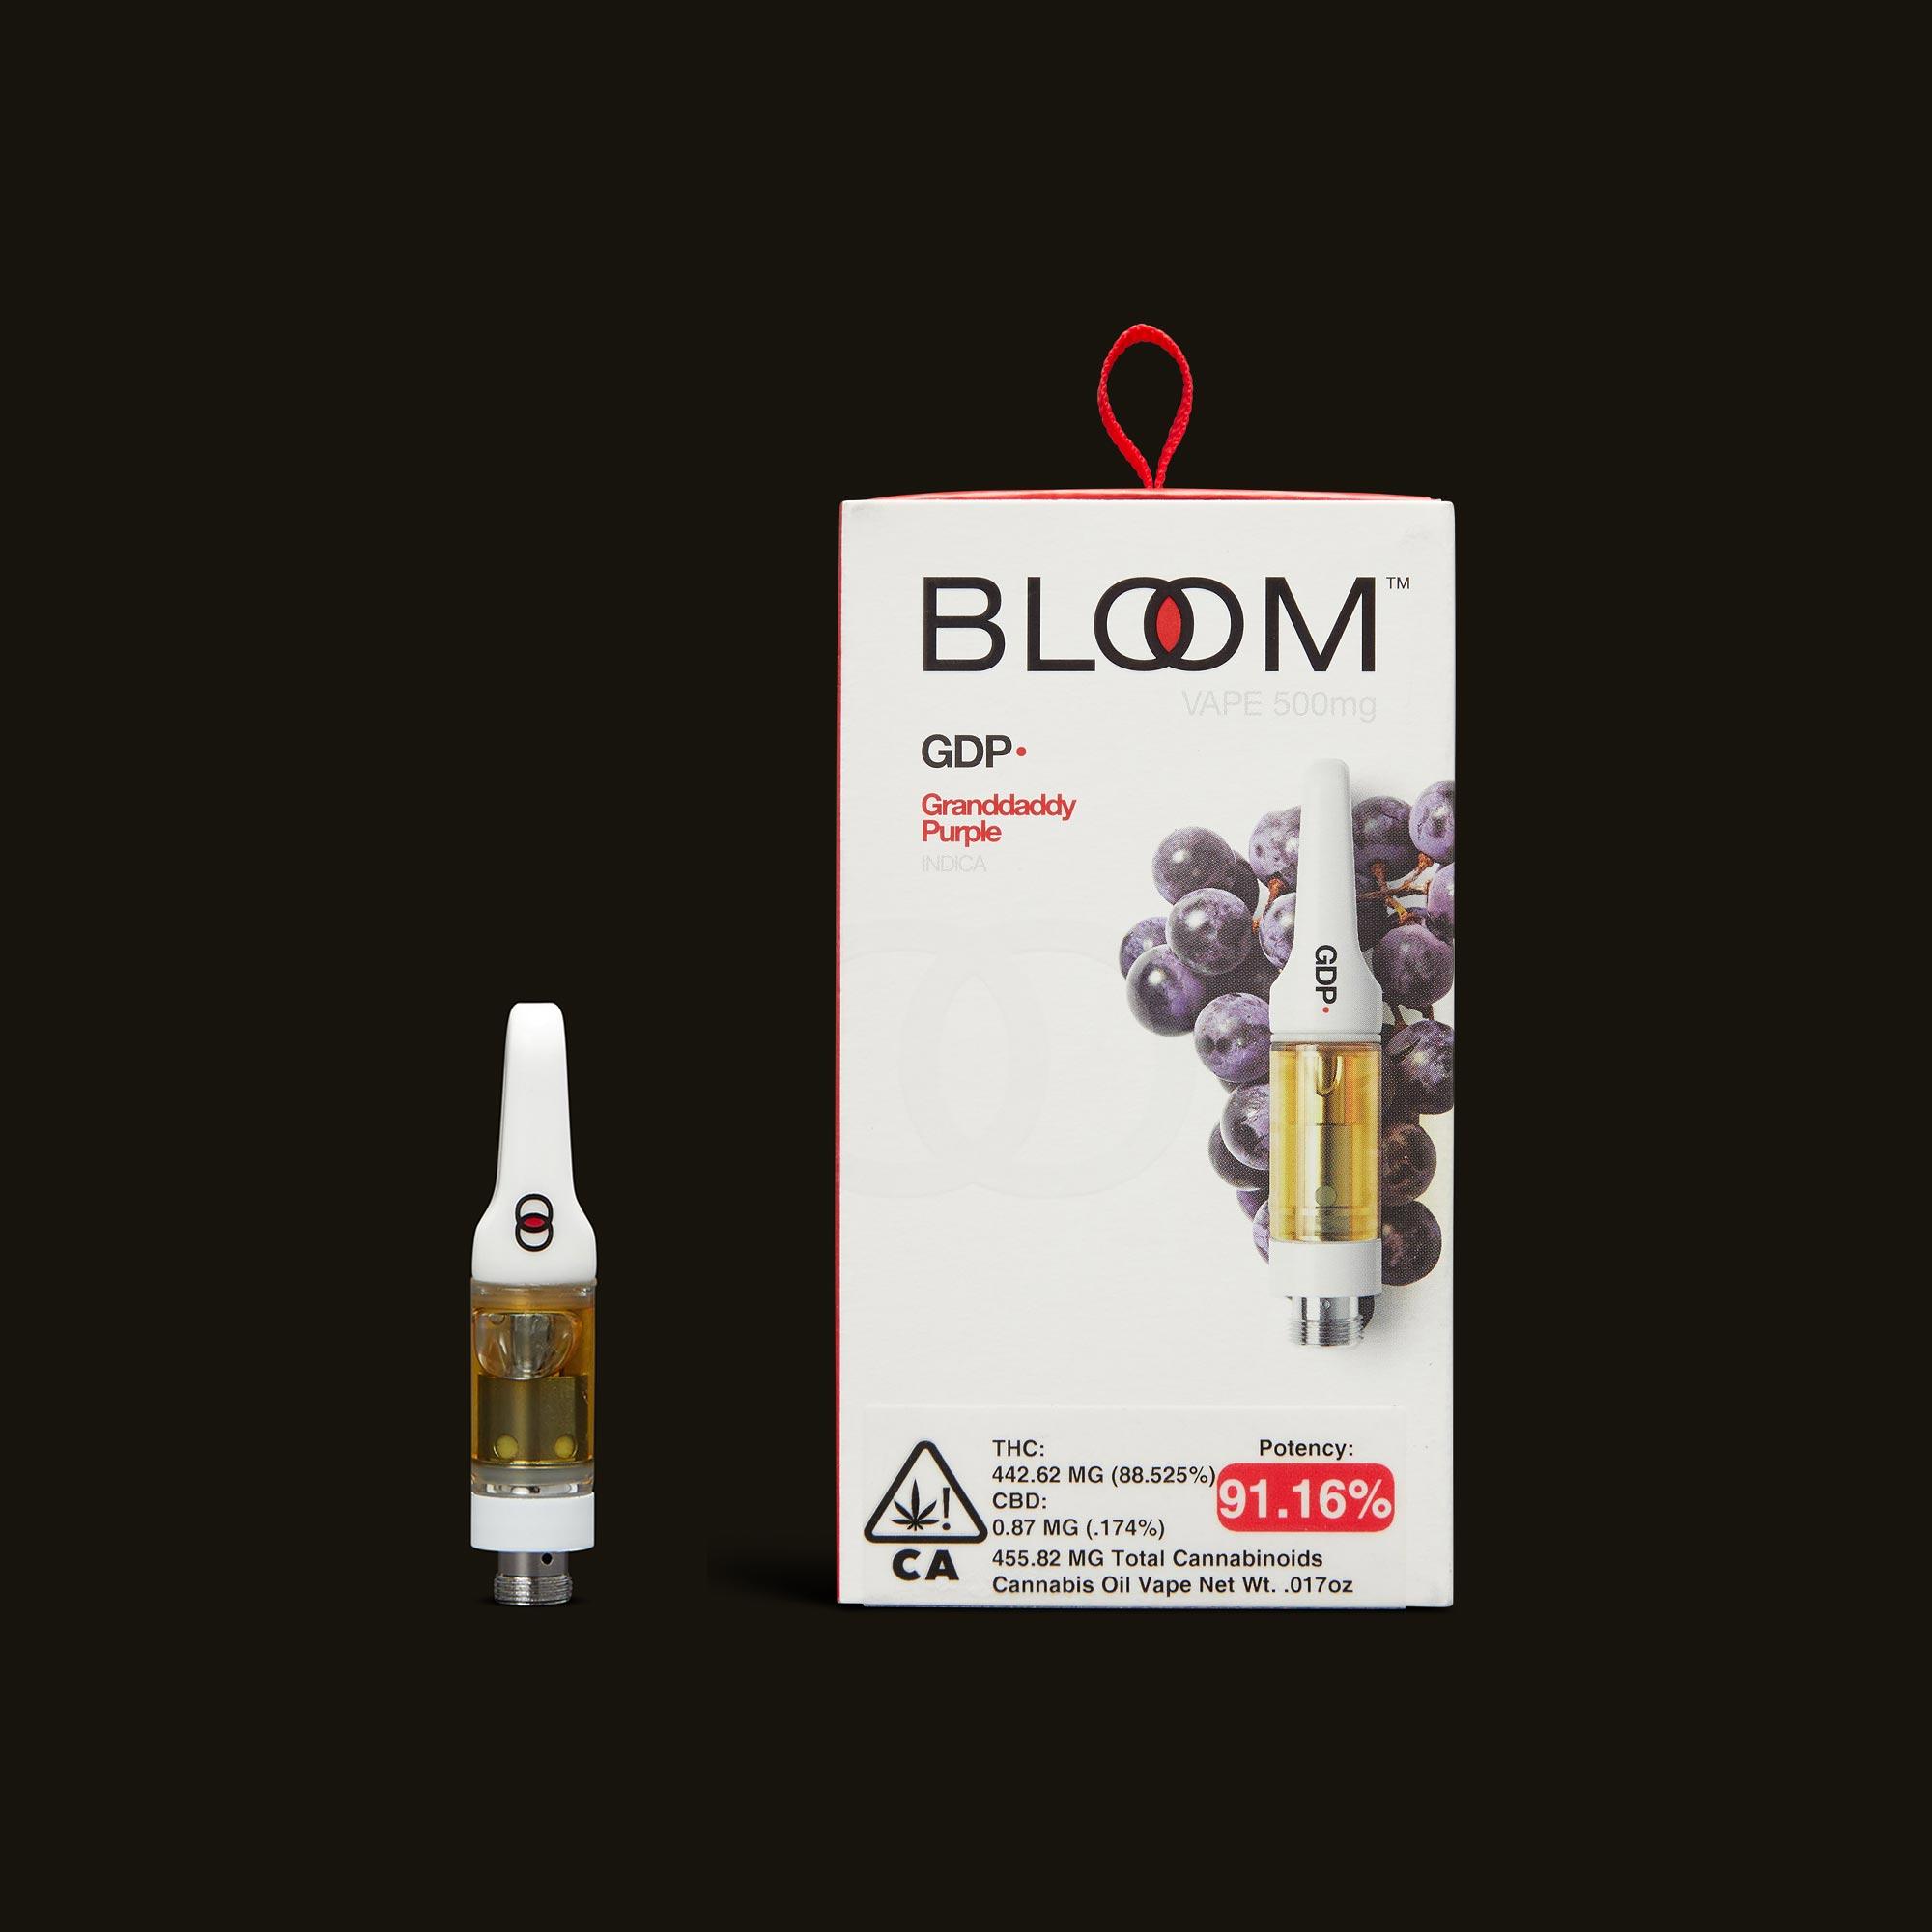 Bloom Brands Granddaddy Purple Cartridge - .5g